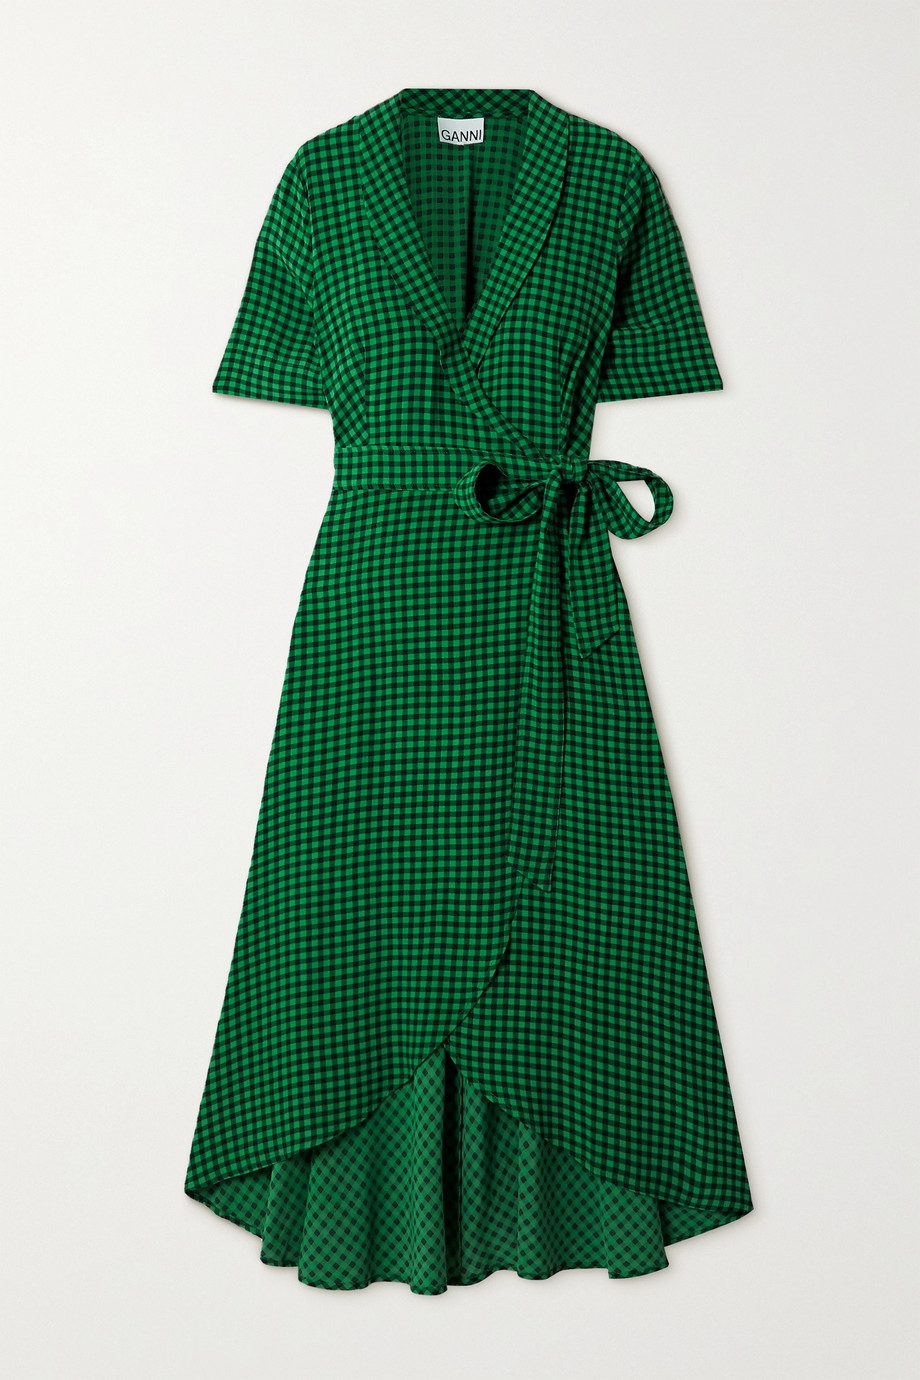 GANNI Gingham crepe midi wrap dress